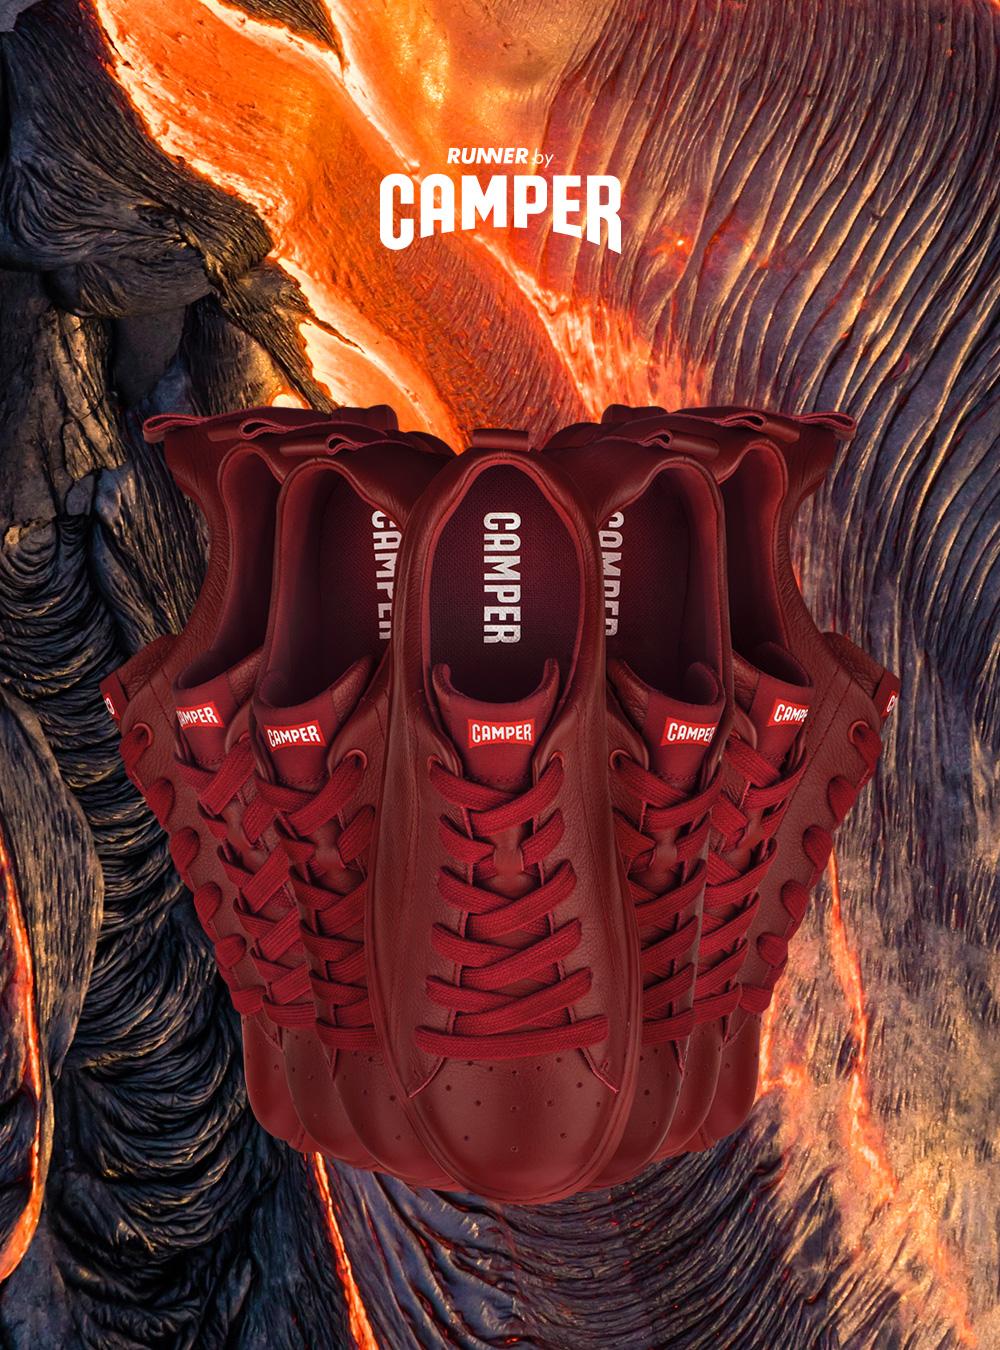 Camper_T87_Webkit_Product-Portrait-Runner_M